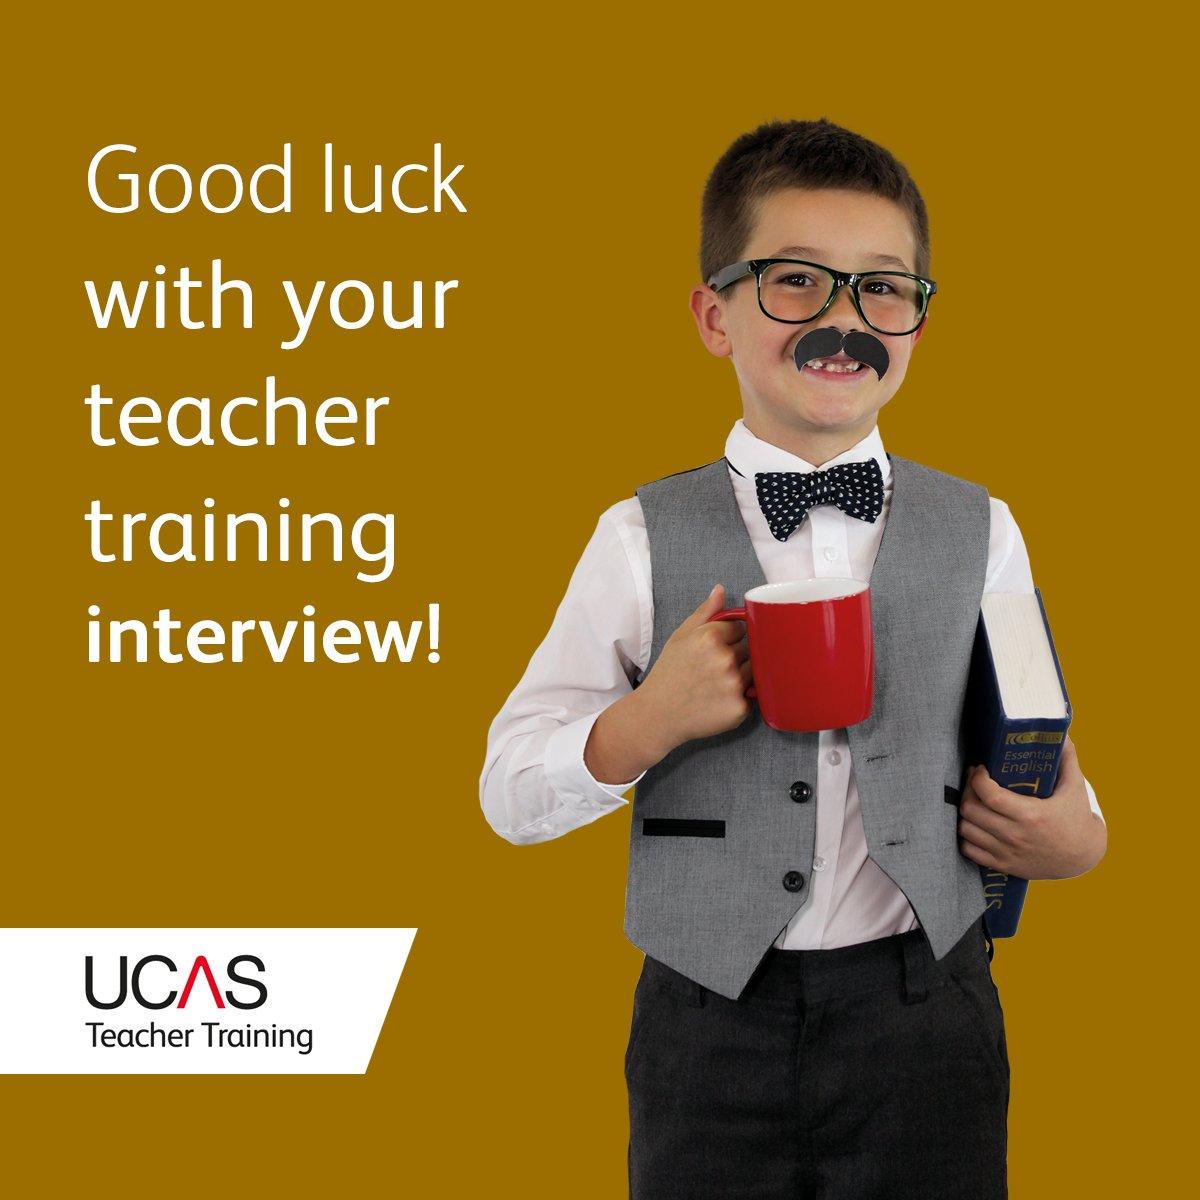 ucas online on teacher training interview coming up we ucas online on teacher training interview coming up we ve got some info to help you prepare t co ivigoiwo9b t co 1srtspjget